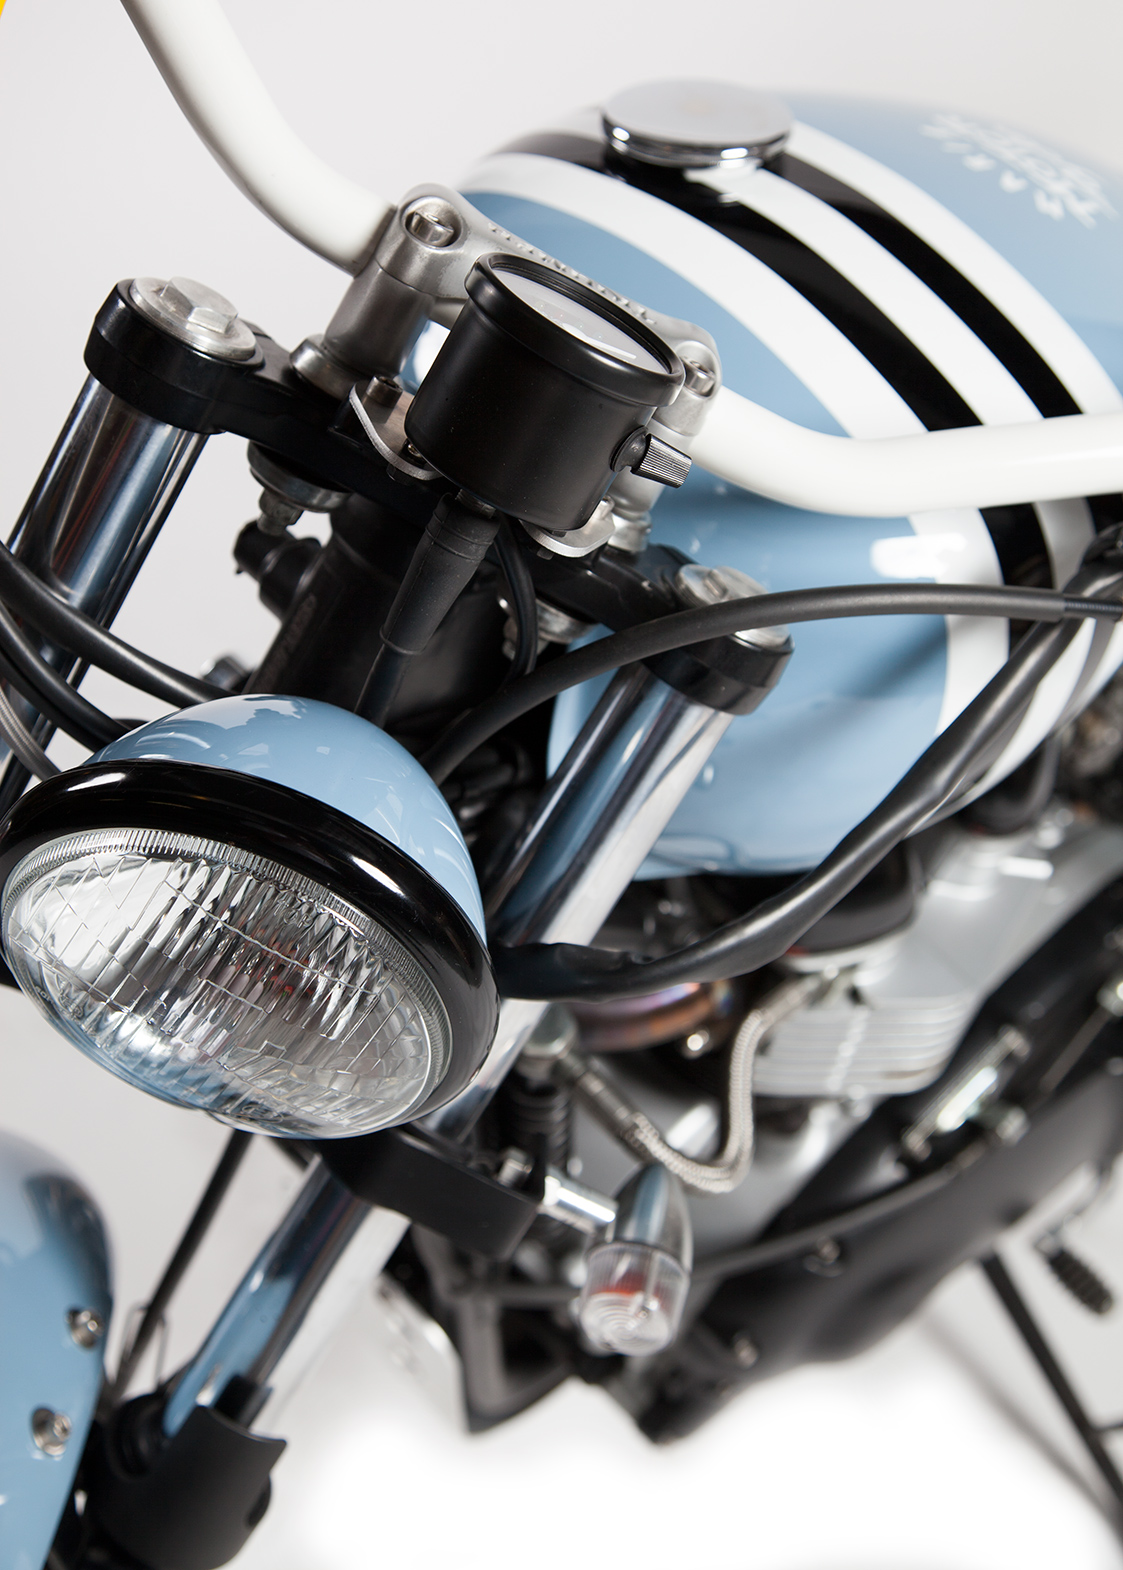 Maria_Motorcycles_Lieutenant_5982